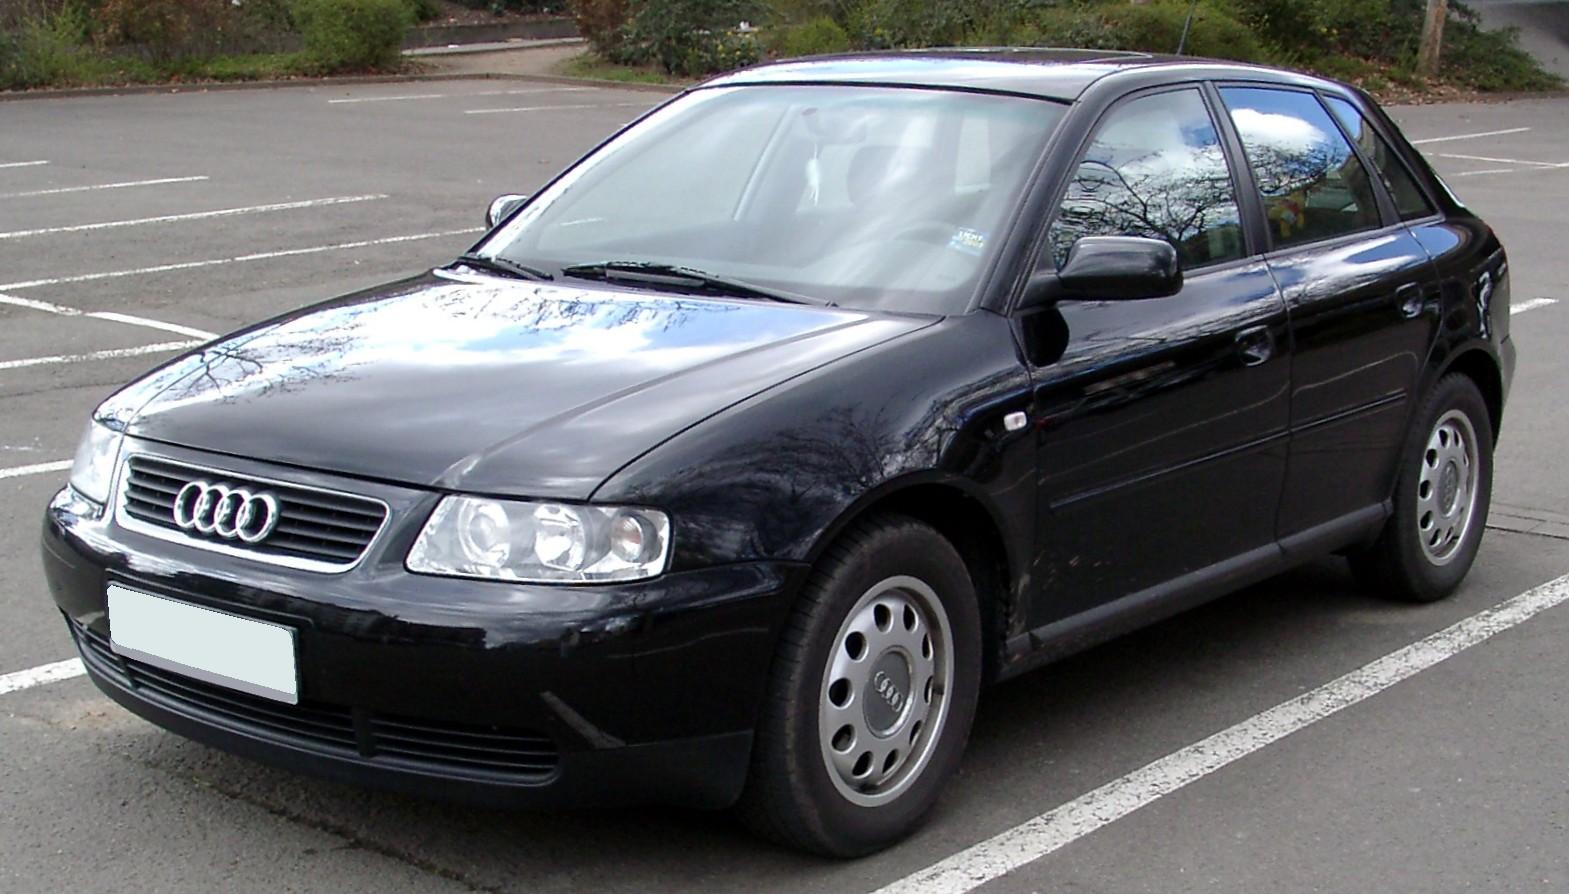 Kelebihan Kekurangan Audi S3 2003 Murah Berkualitas